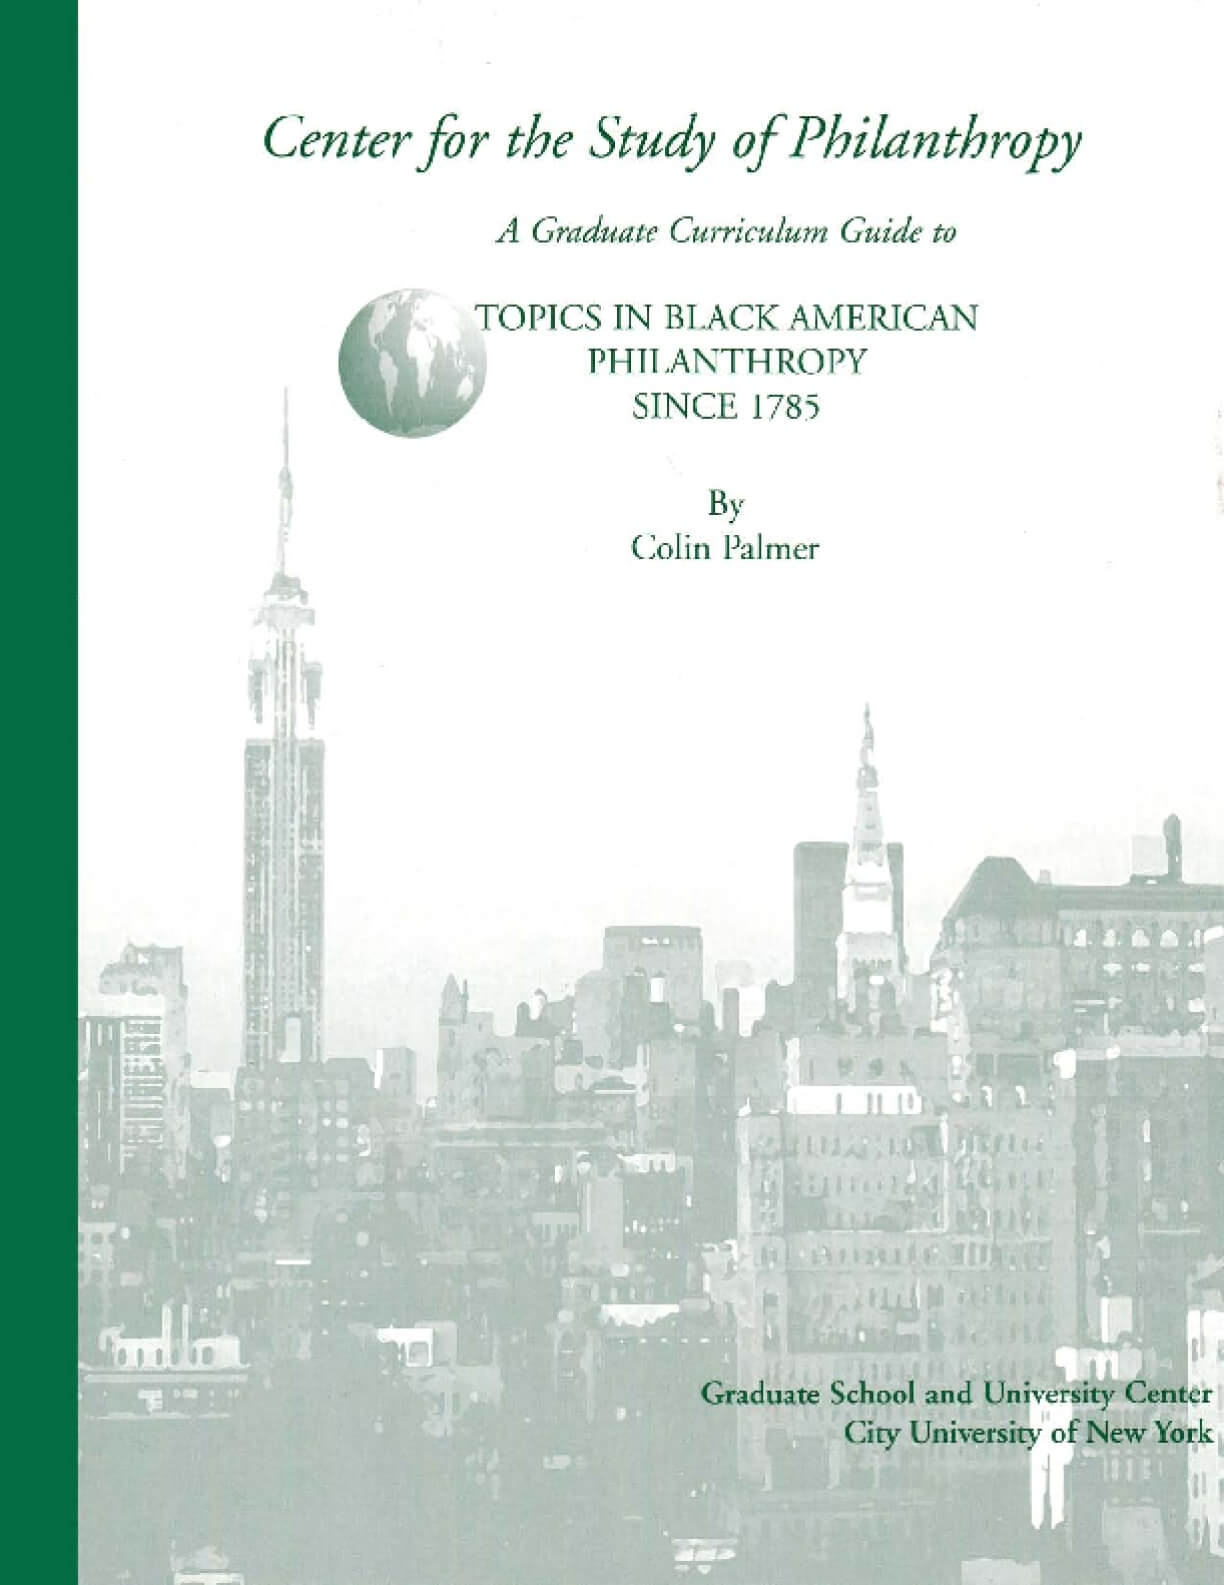 A Graduate Curriculum Guide to Topics in Black American Philanthropy Since 1785